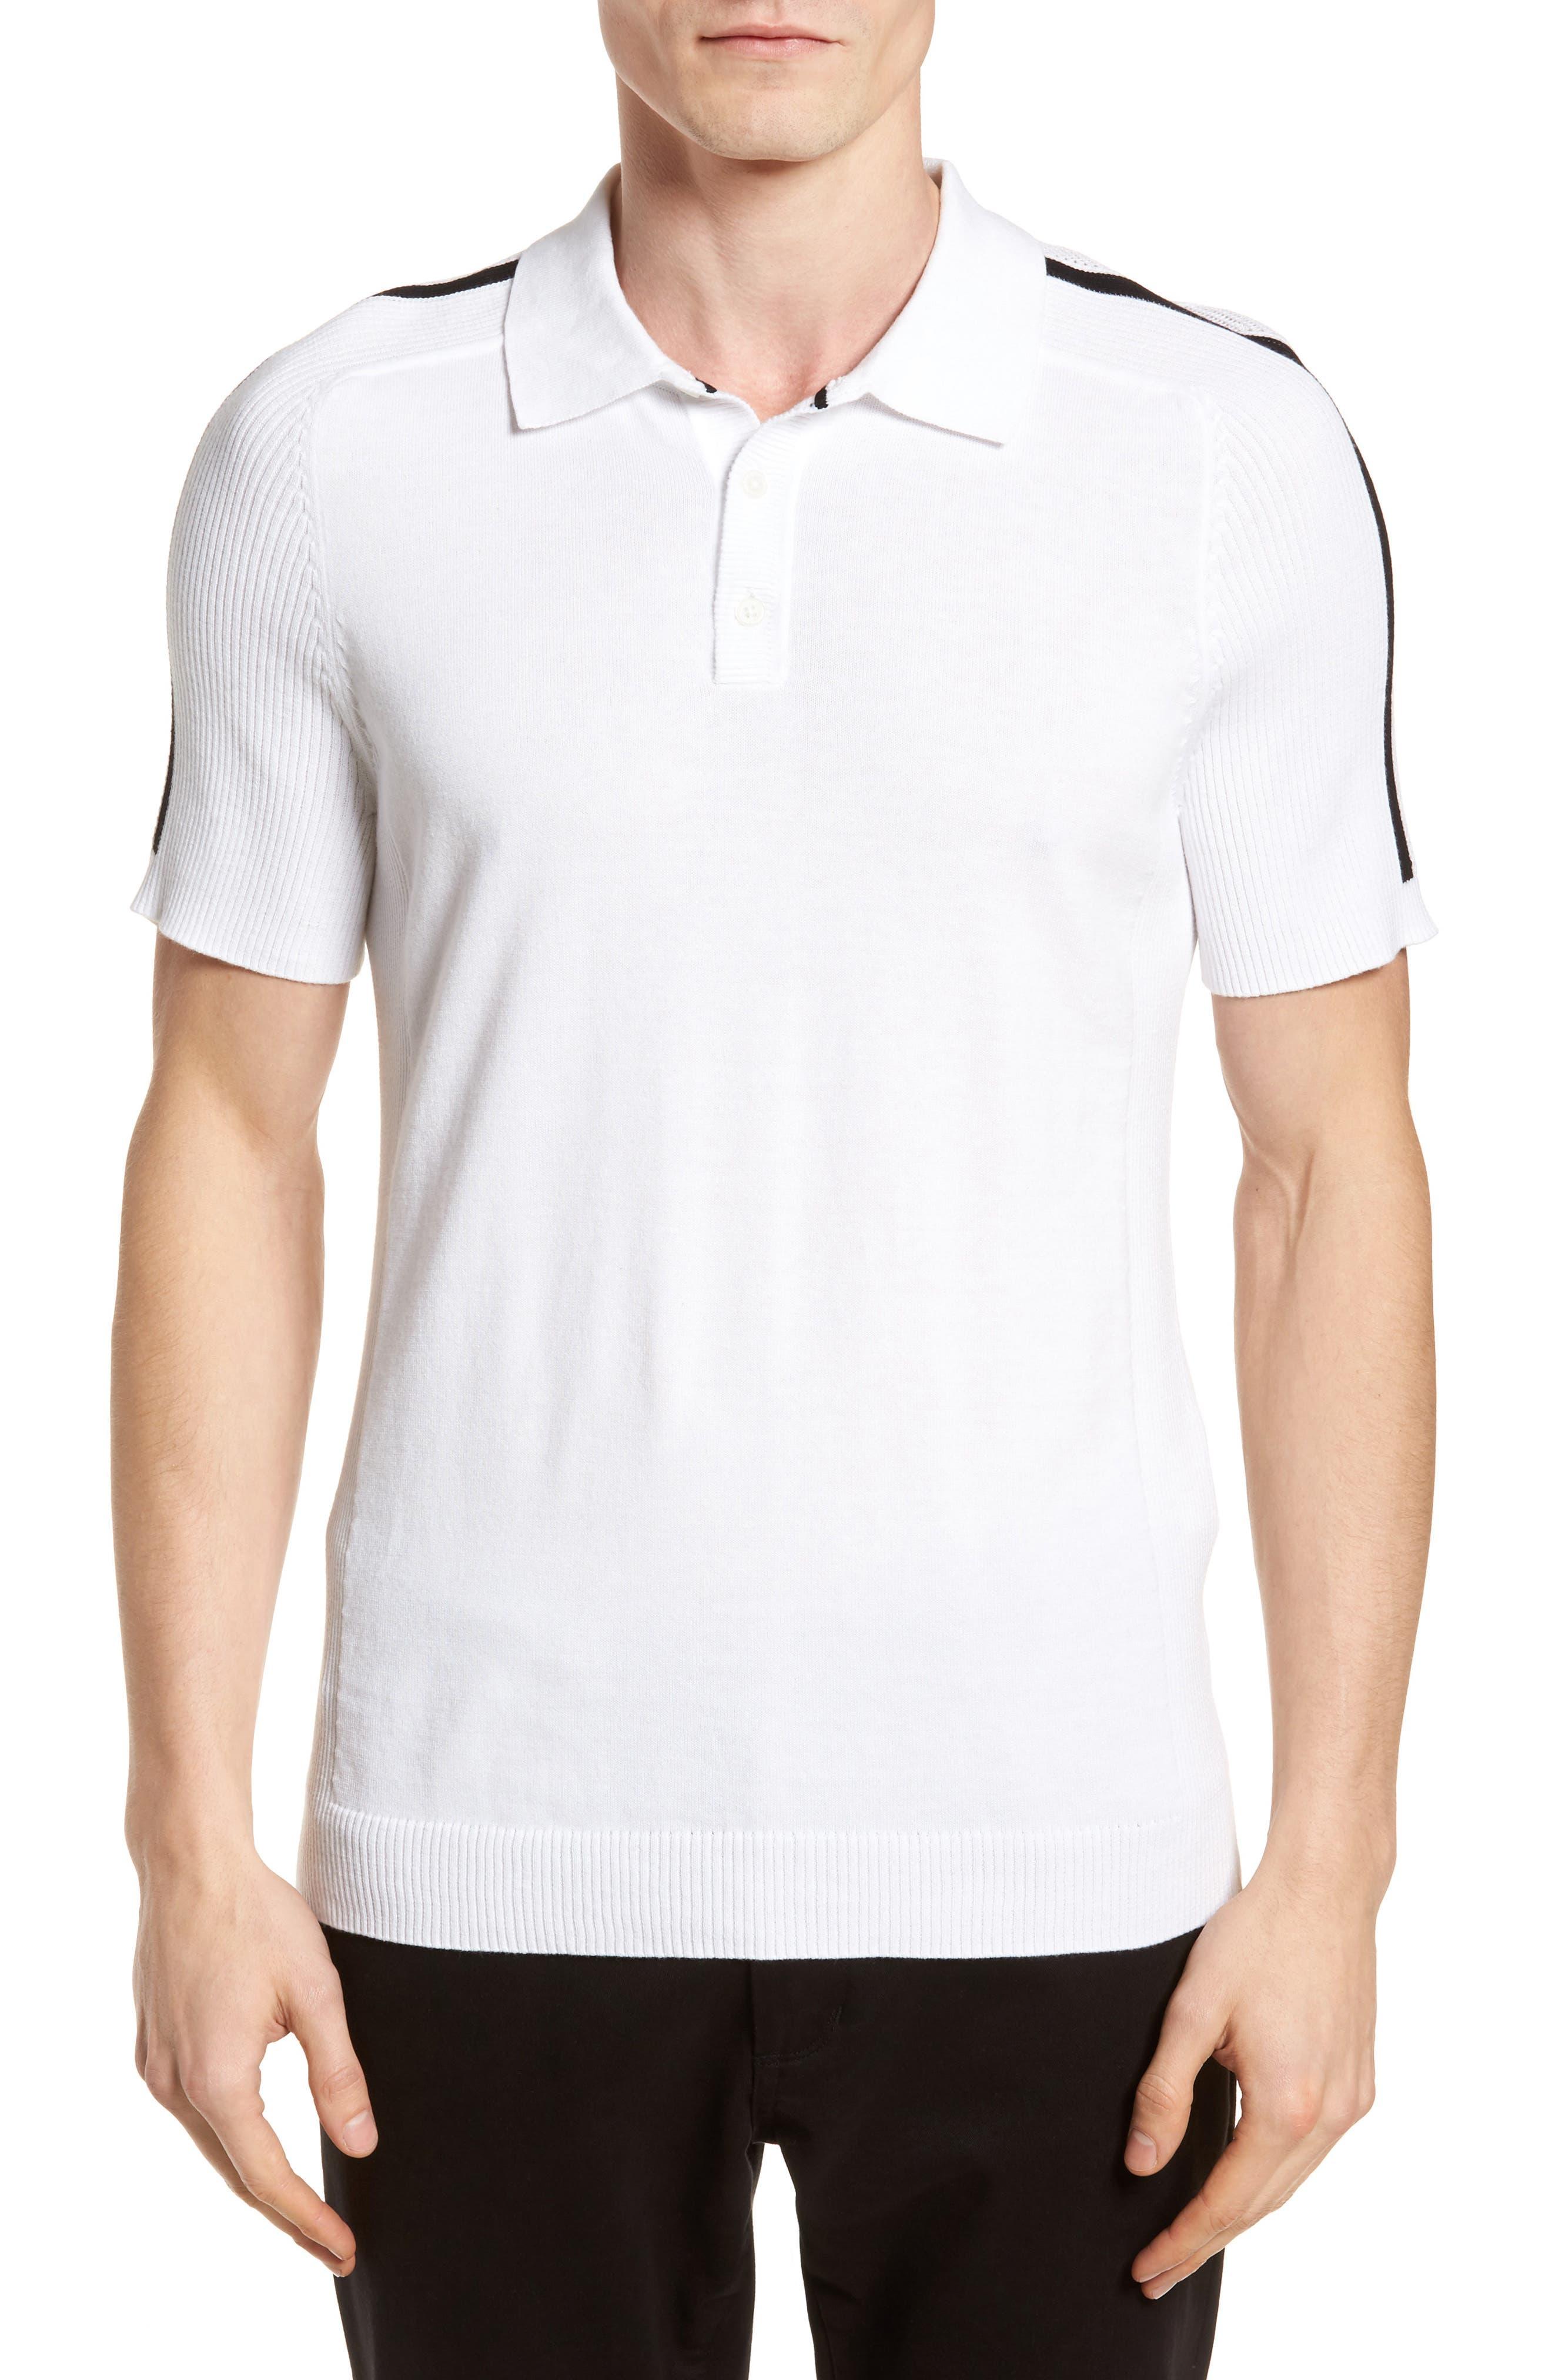 Sweater Polo,                         Main,                         color, White/ Black